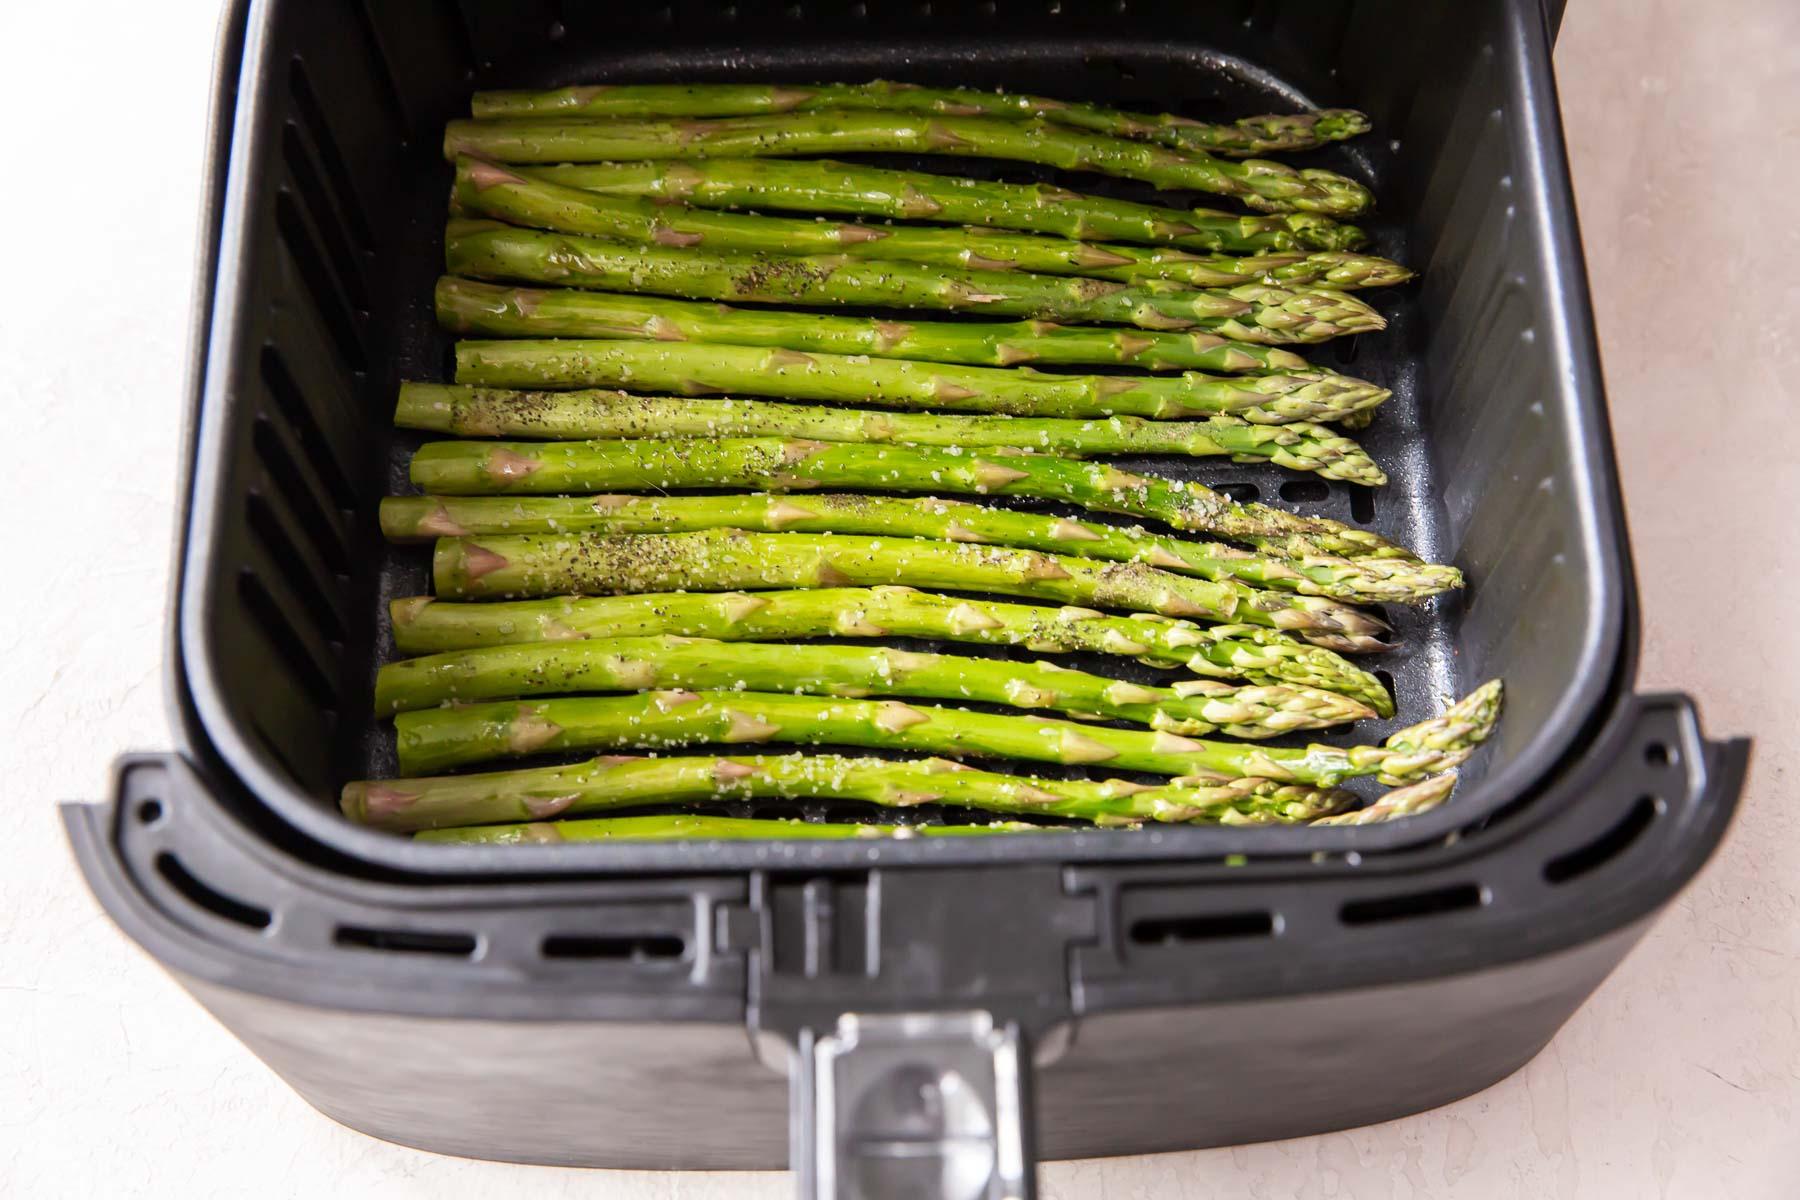 asparagus in air fryer basket before cooking